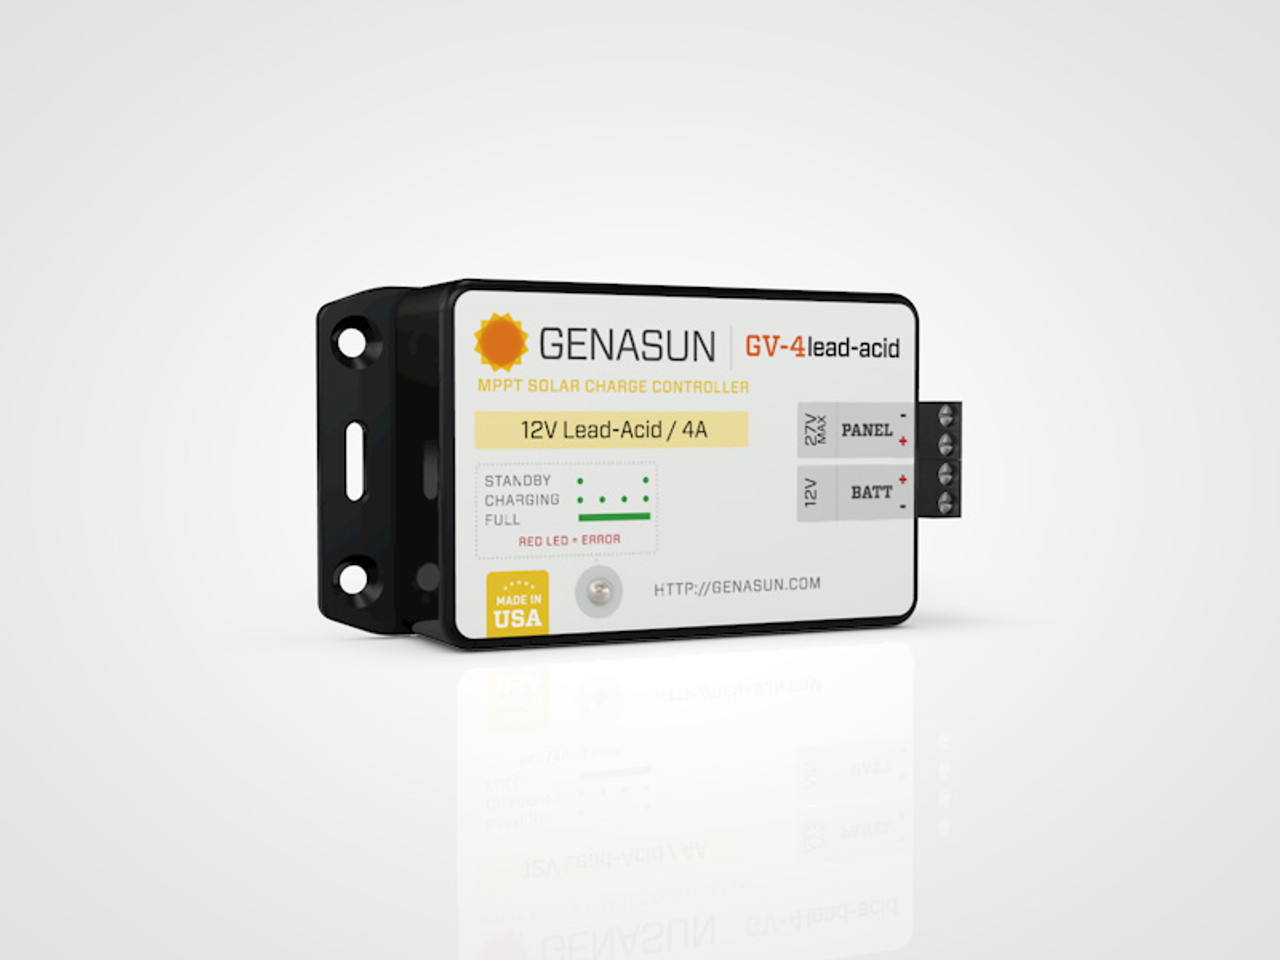 GV-4   50W 4A Genasun MPPT Solar Charge Controller - Pb - Left1